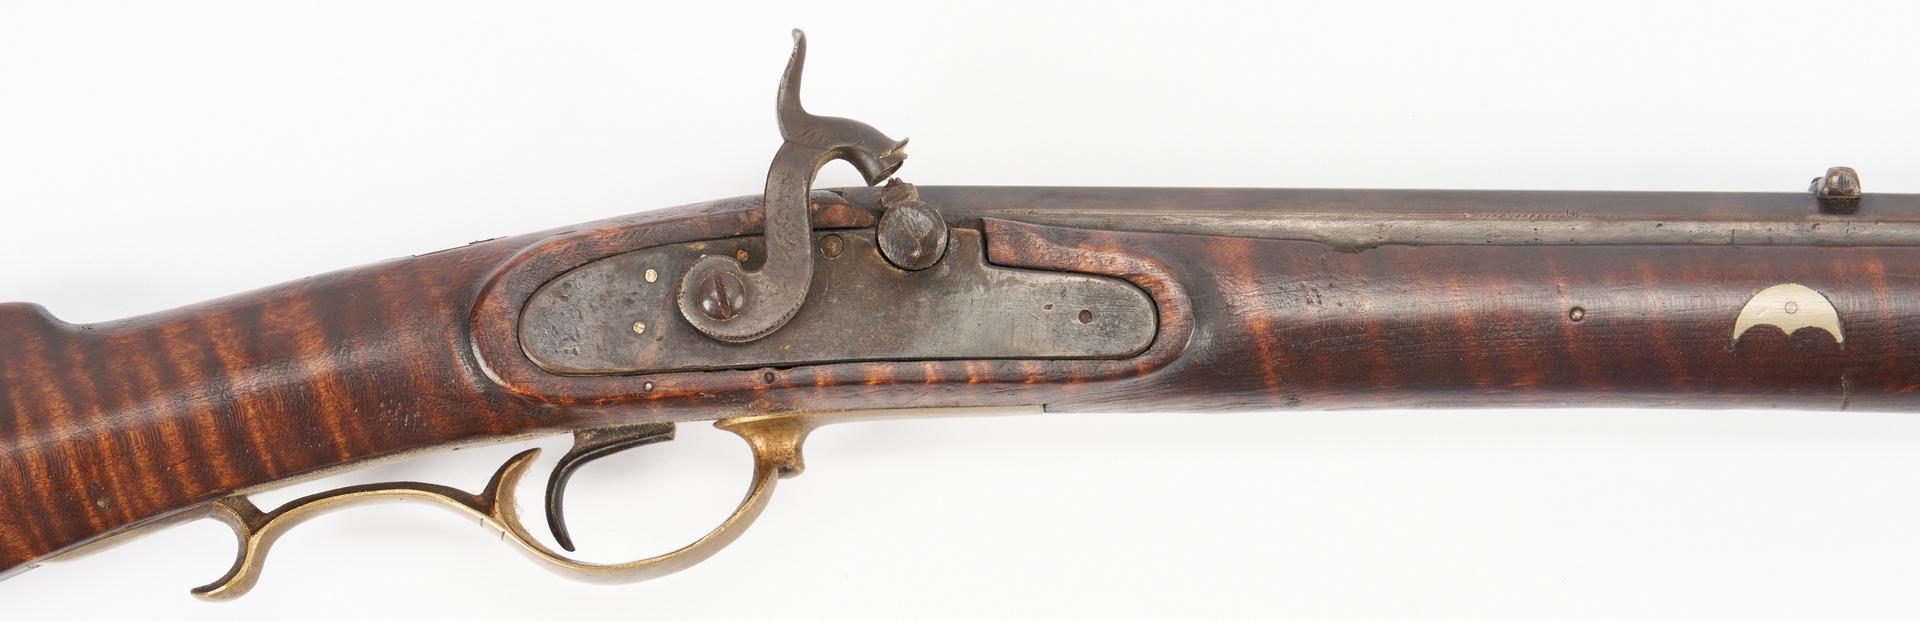 Lot 620: Pennsylvania Curly Maple Long Rifle